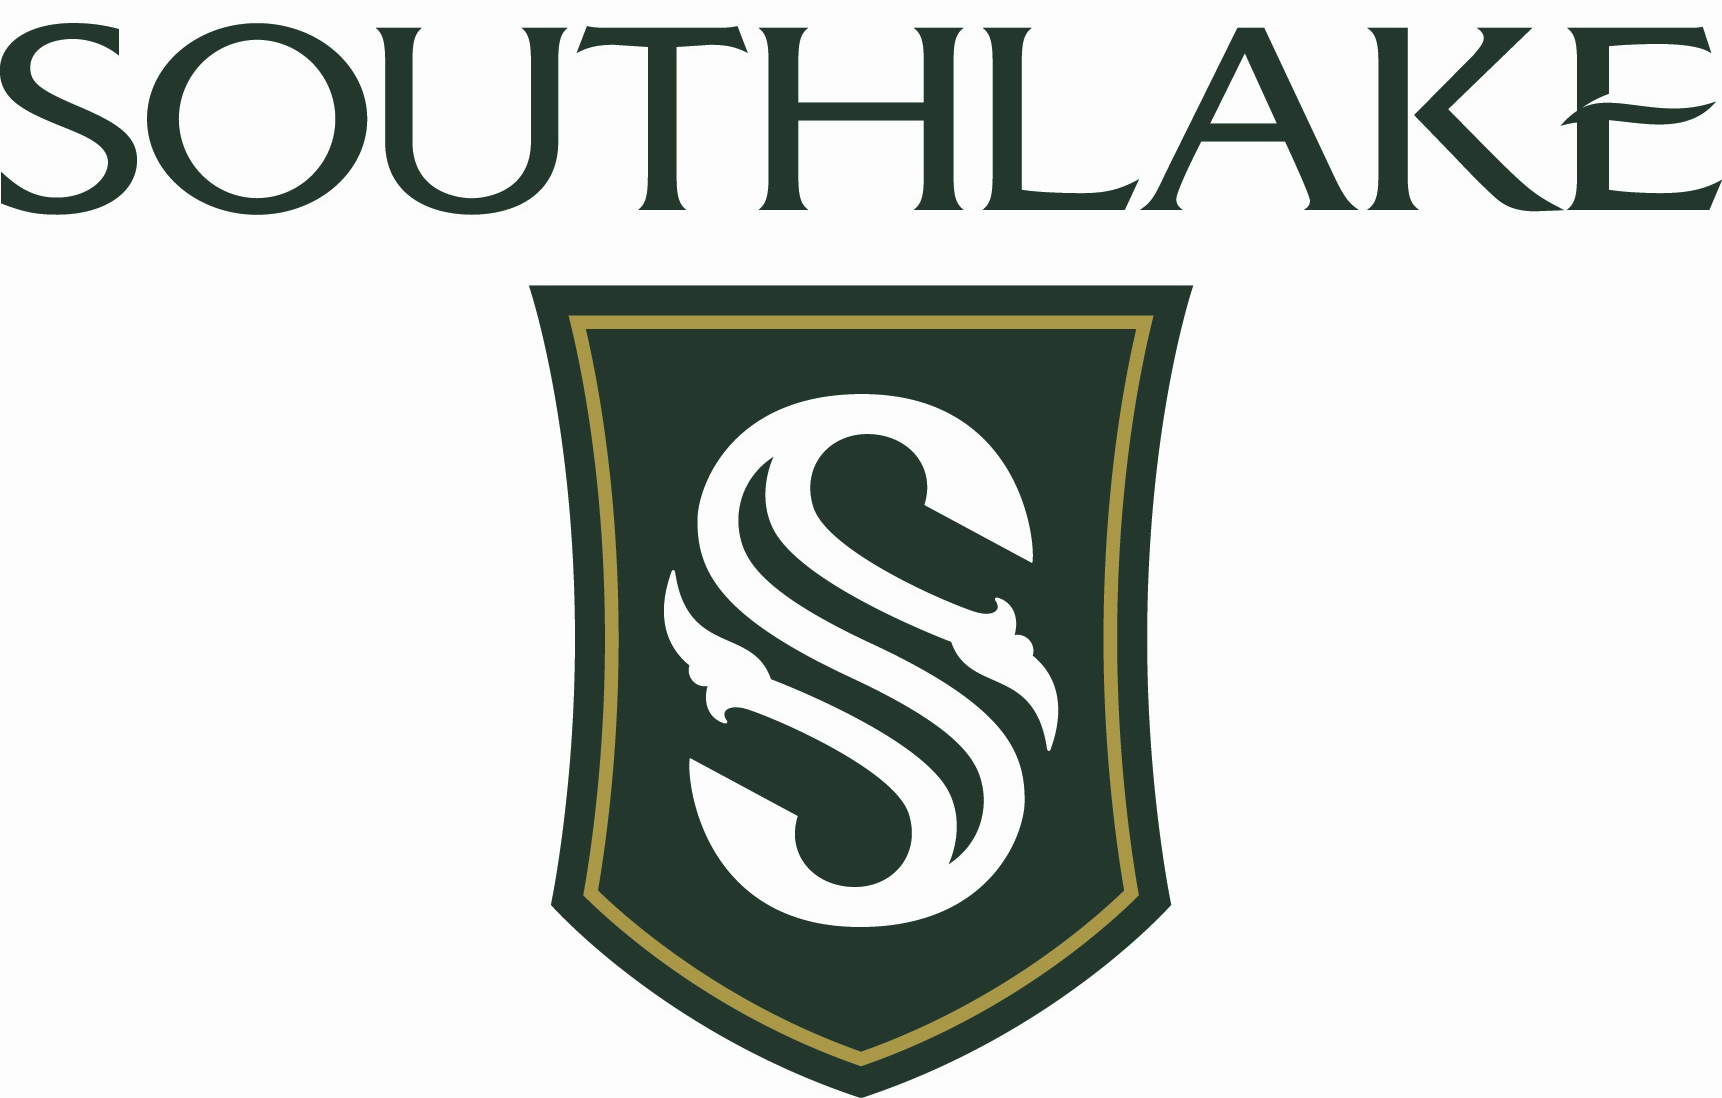 southlake-texas-1.png